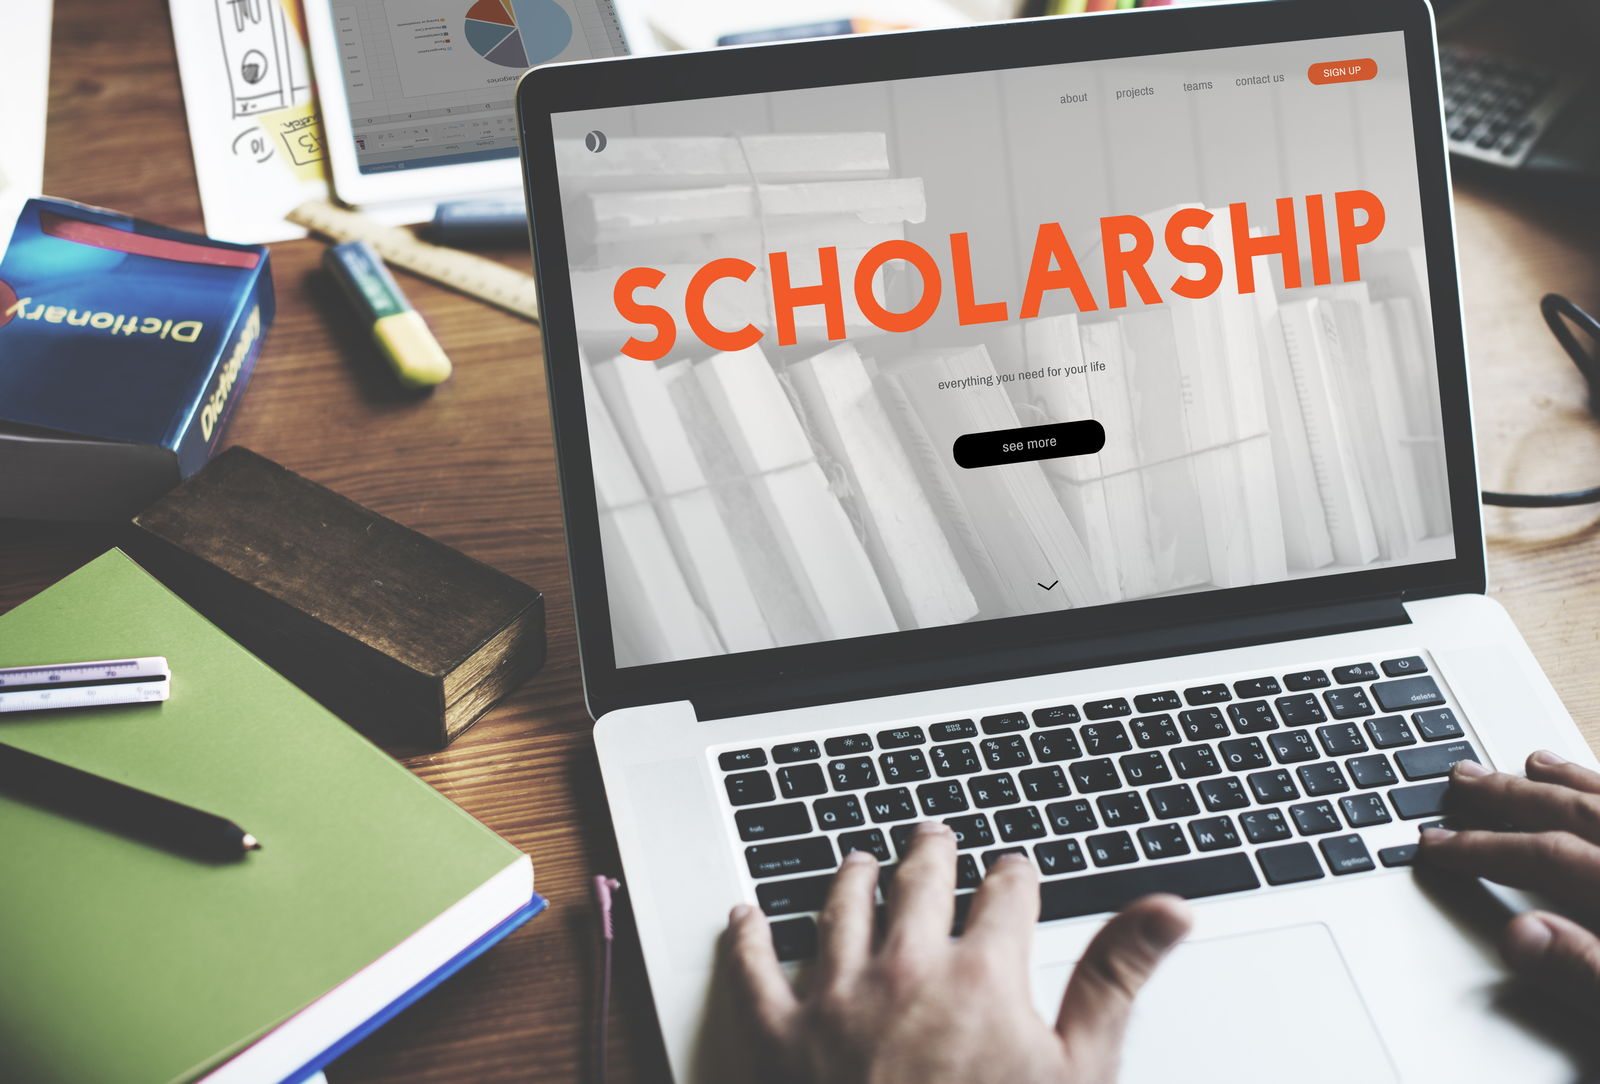 Scholarship written on computer screen